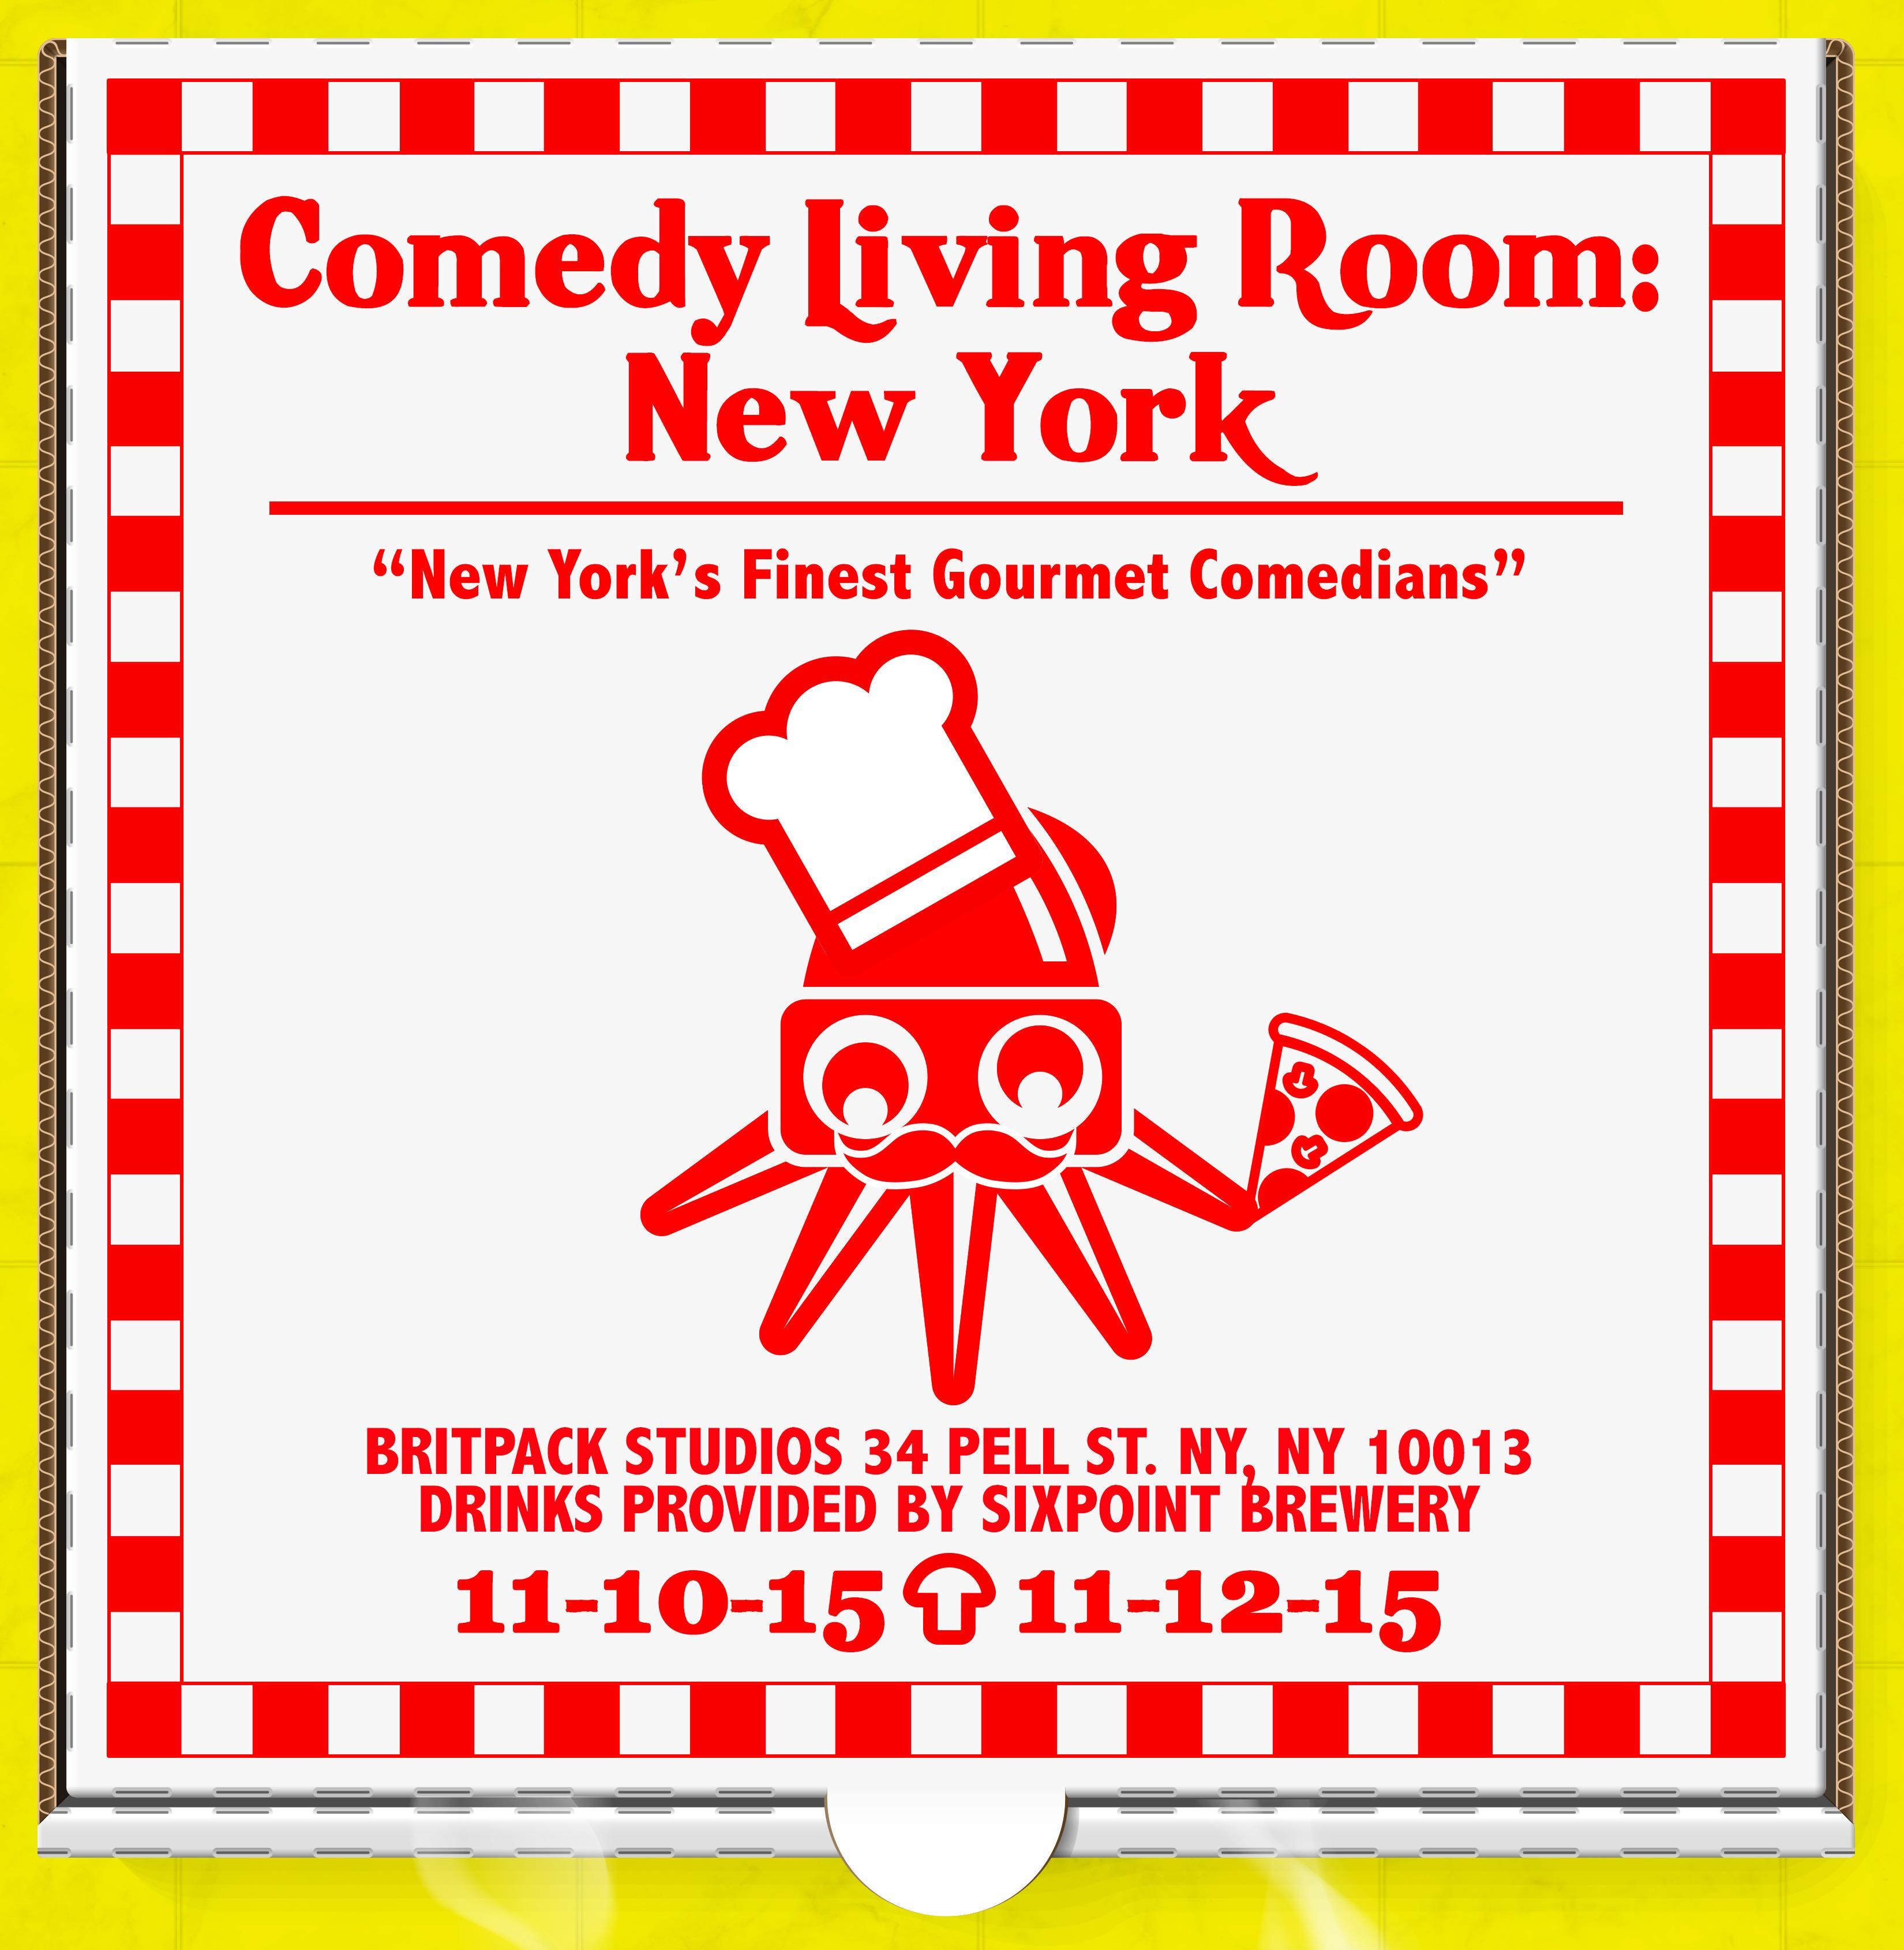 Comedy Living Room New York 11 10 11 12 Tickets Thu Nov 12 2015 At 7 00 Pm Eventbrite